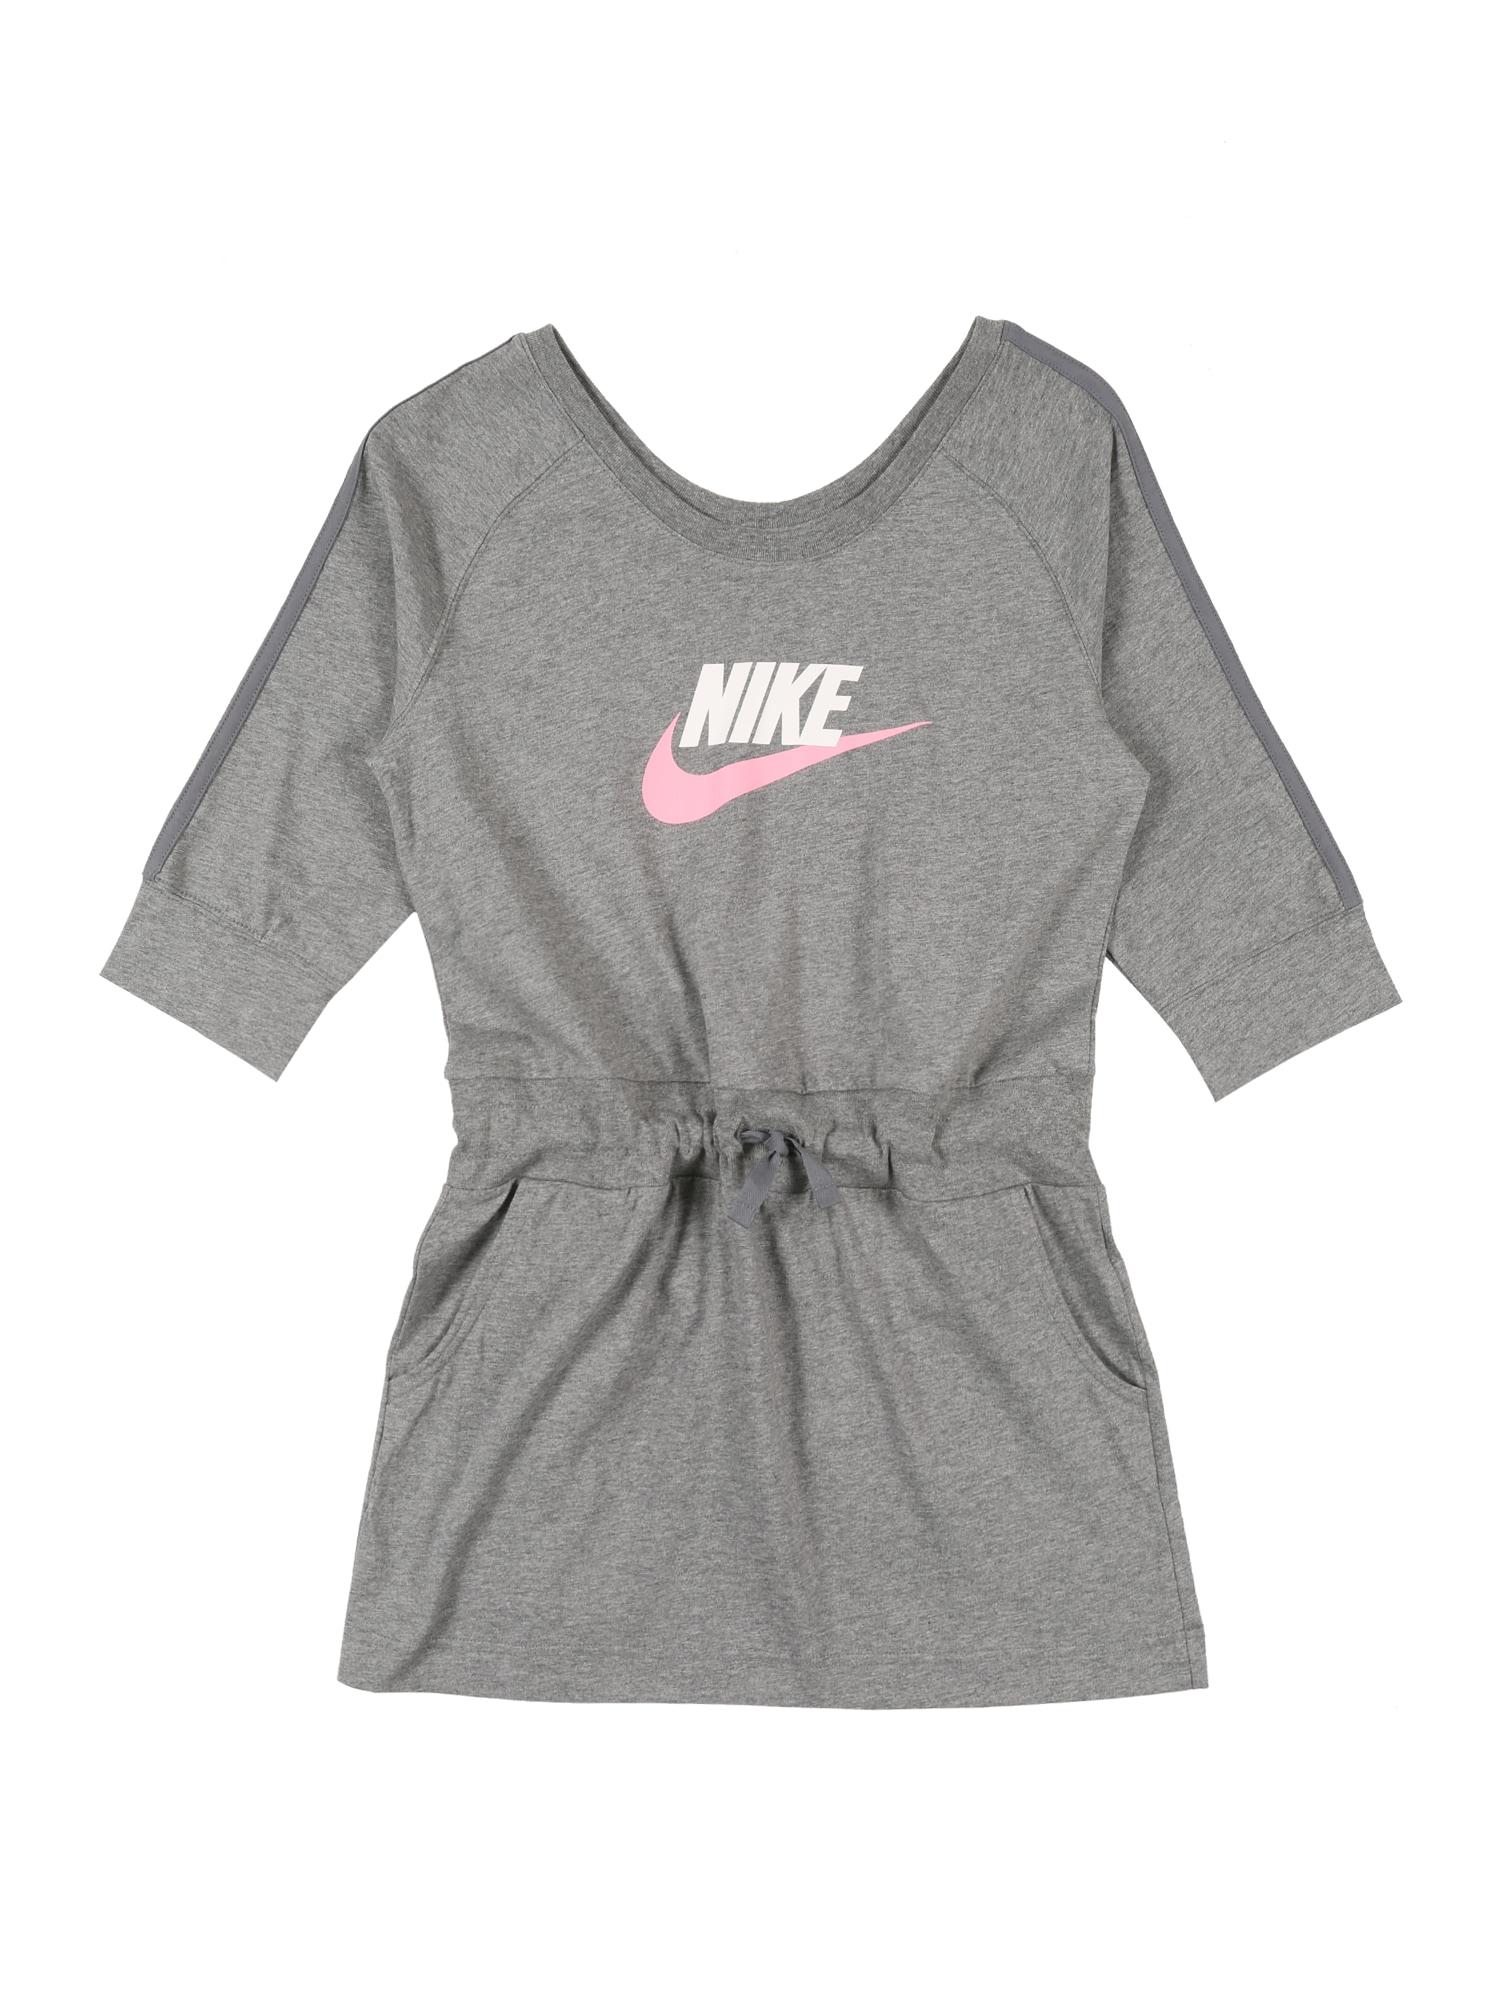 Nike Sportswear Šaty  sivá / ružová